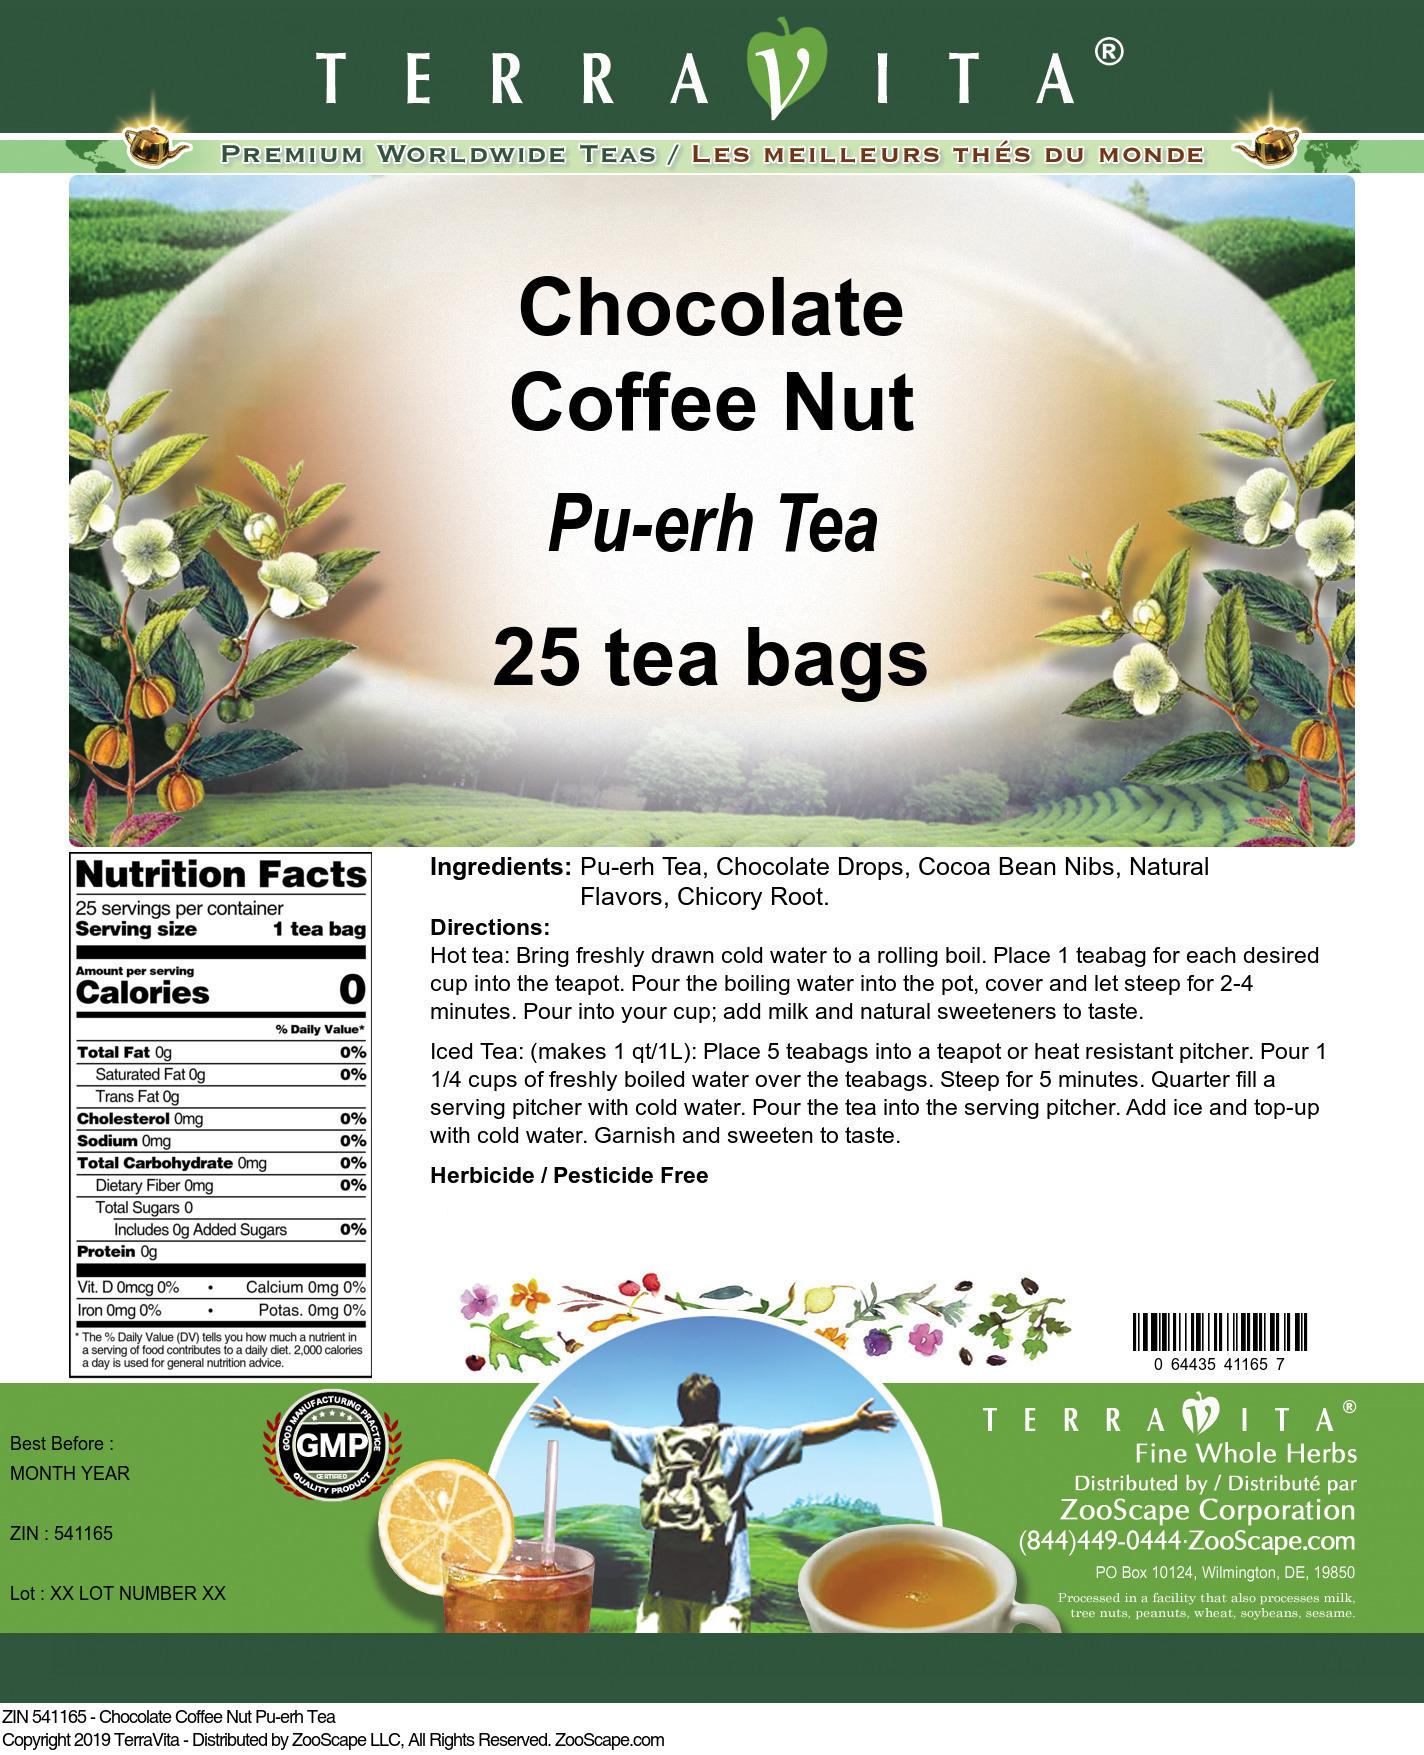 Chocolate Coffee Nut Pu-erh Tea